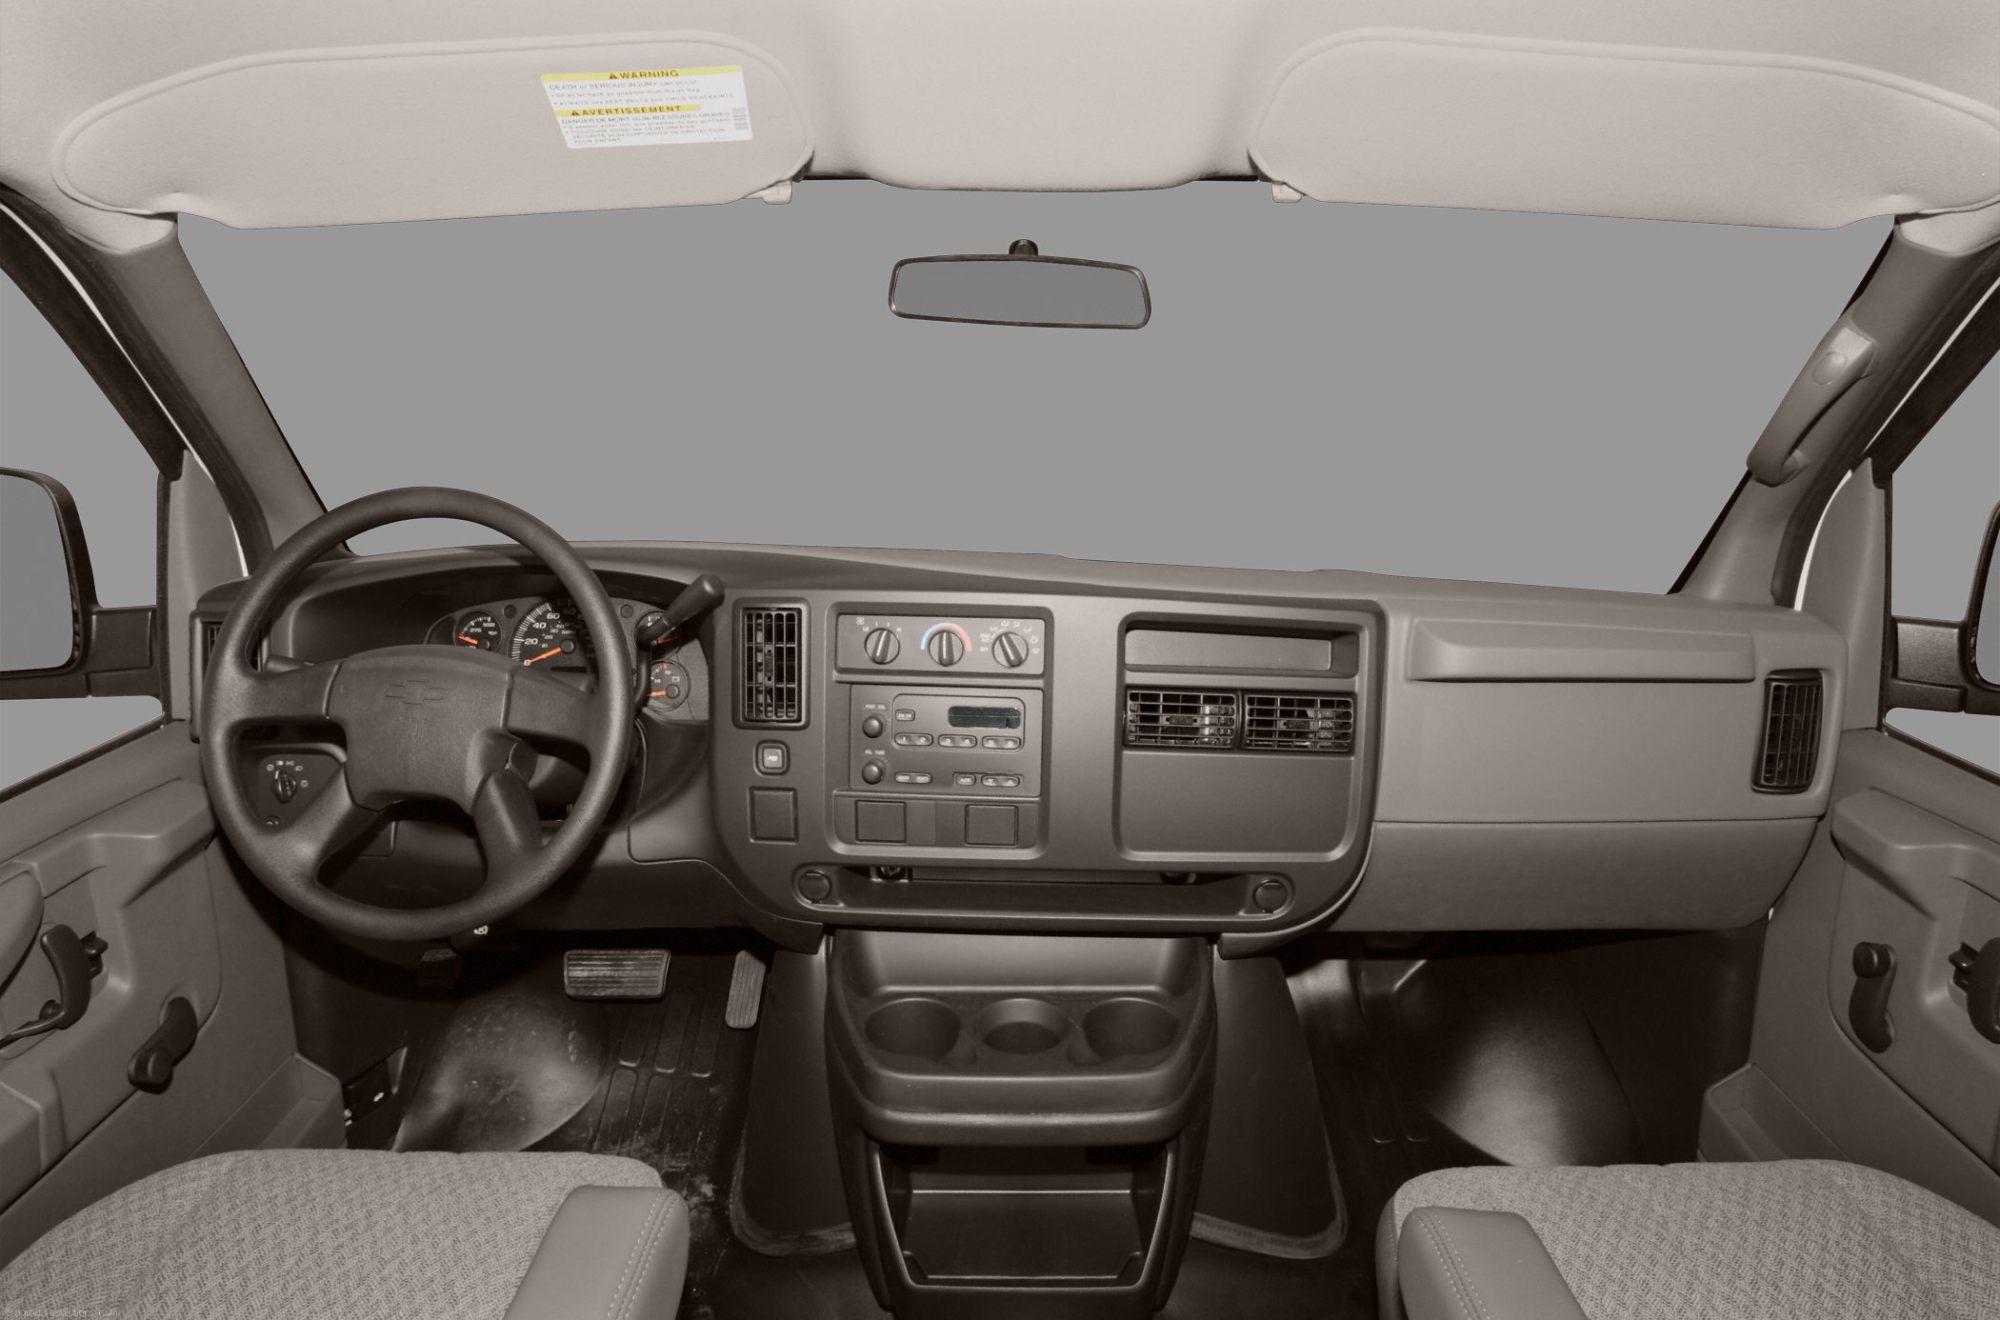 hight resolution of chevrolet express interior